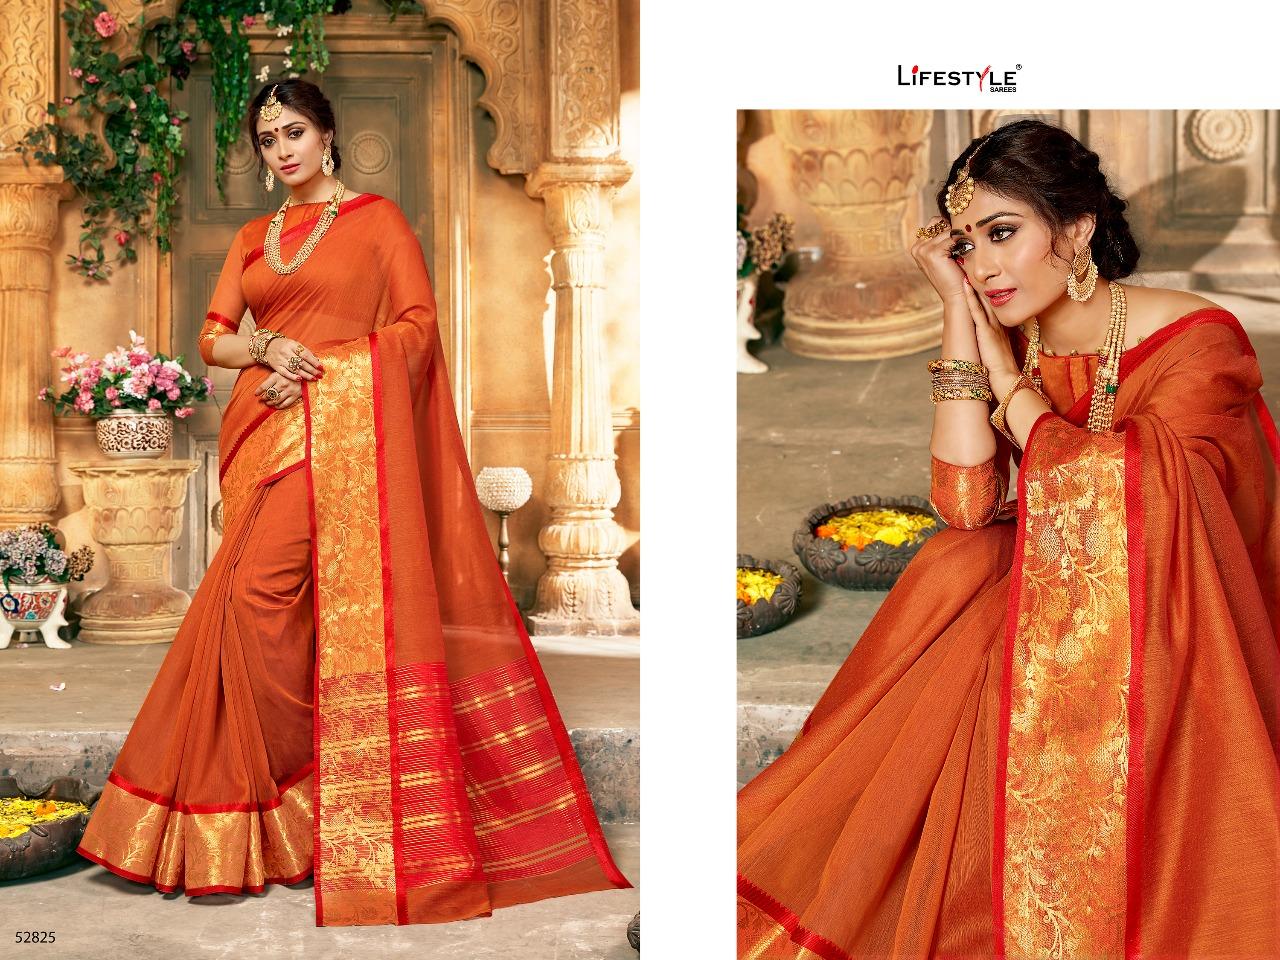 Lifestyle Khadi silk vol 16 52825